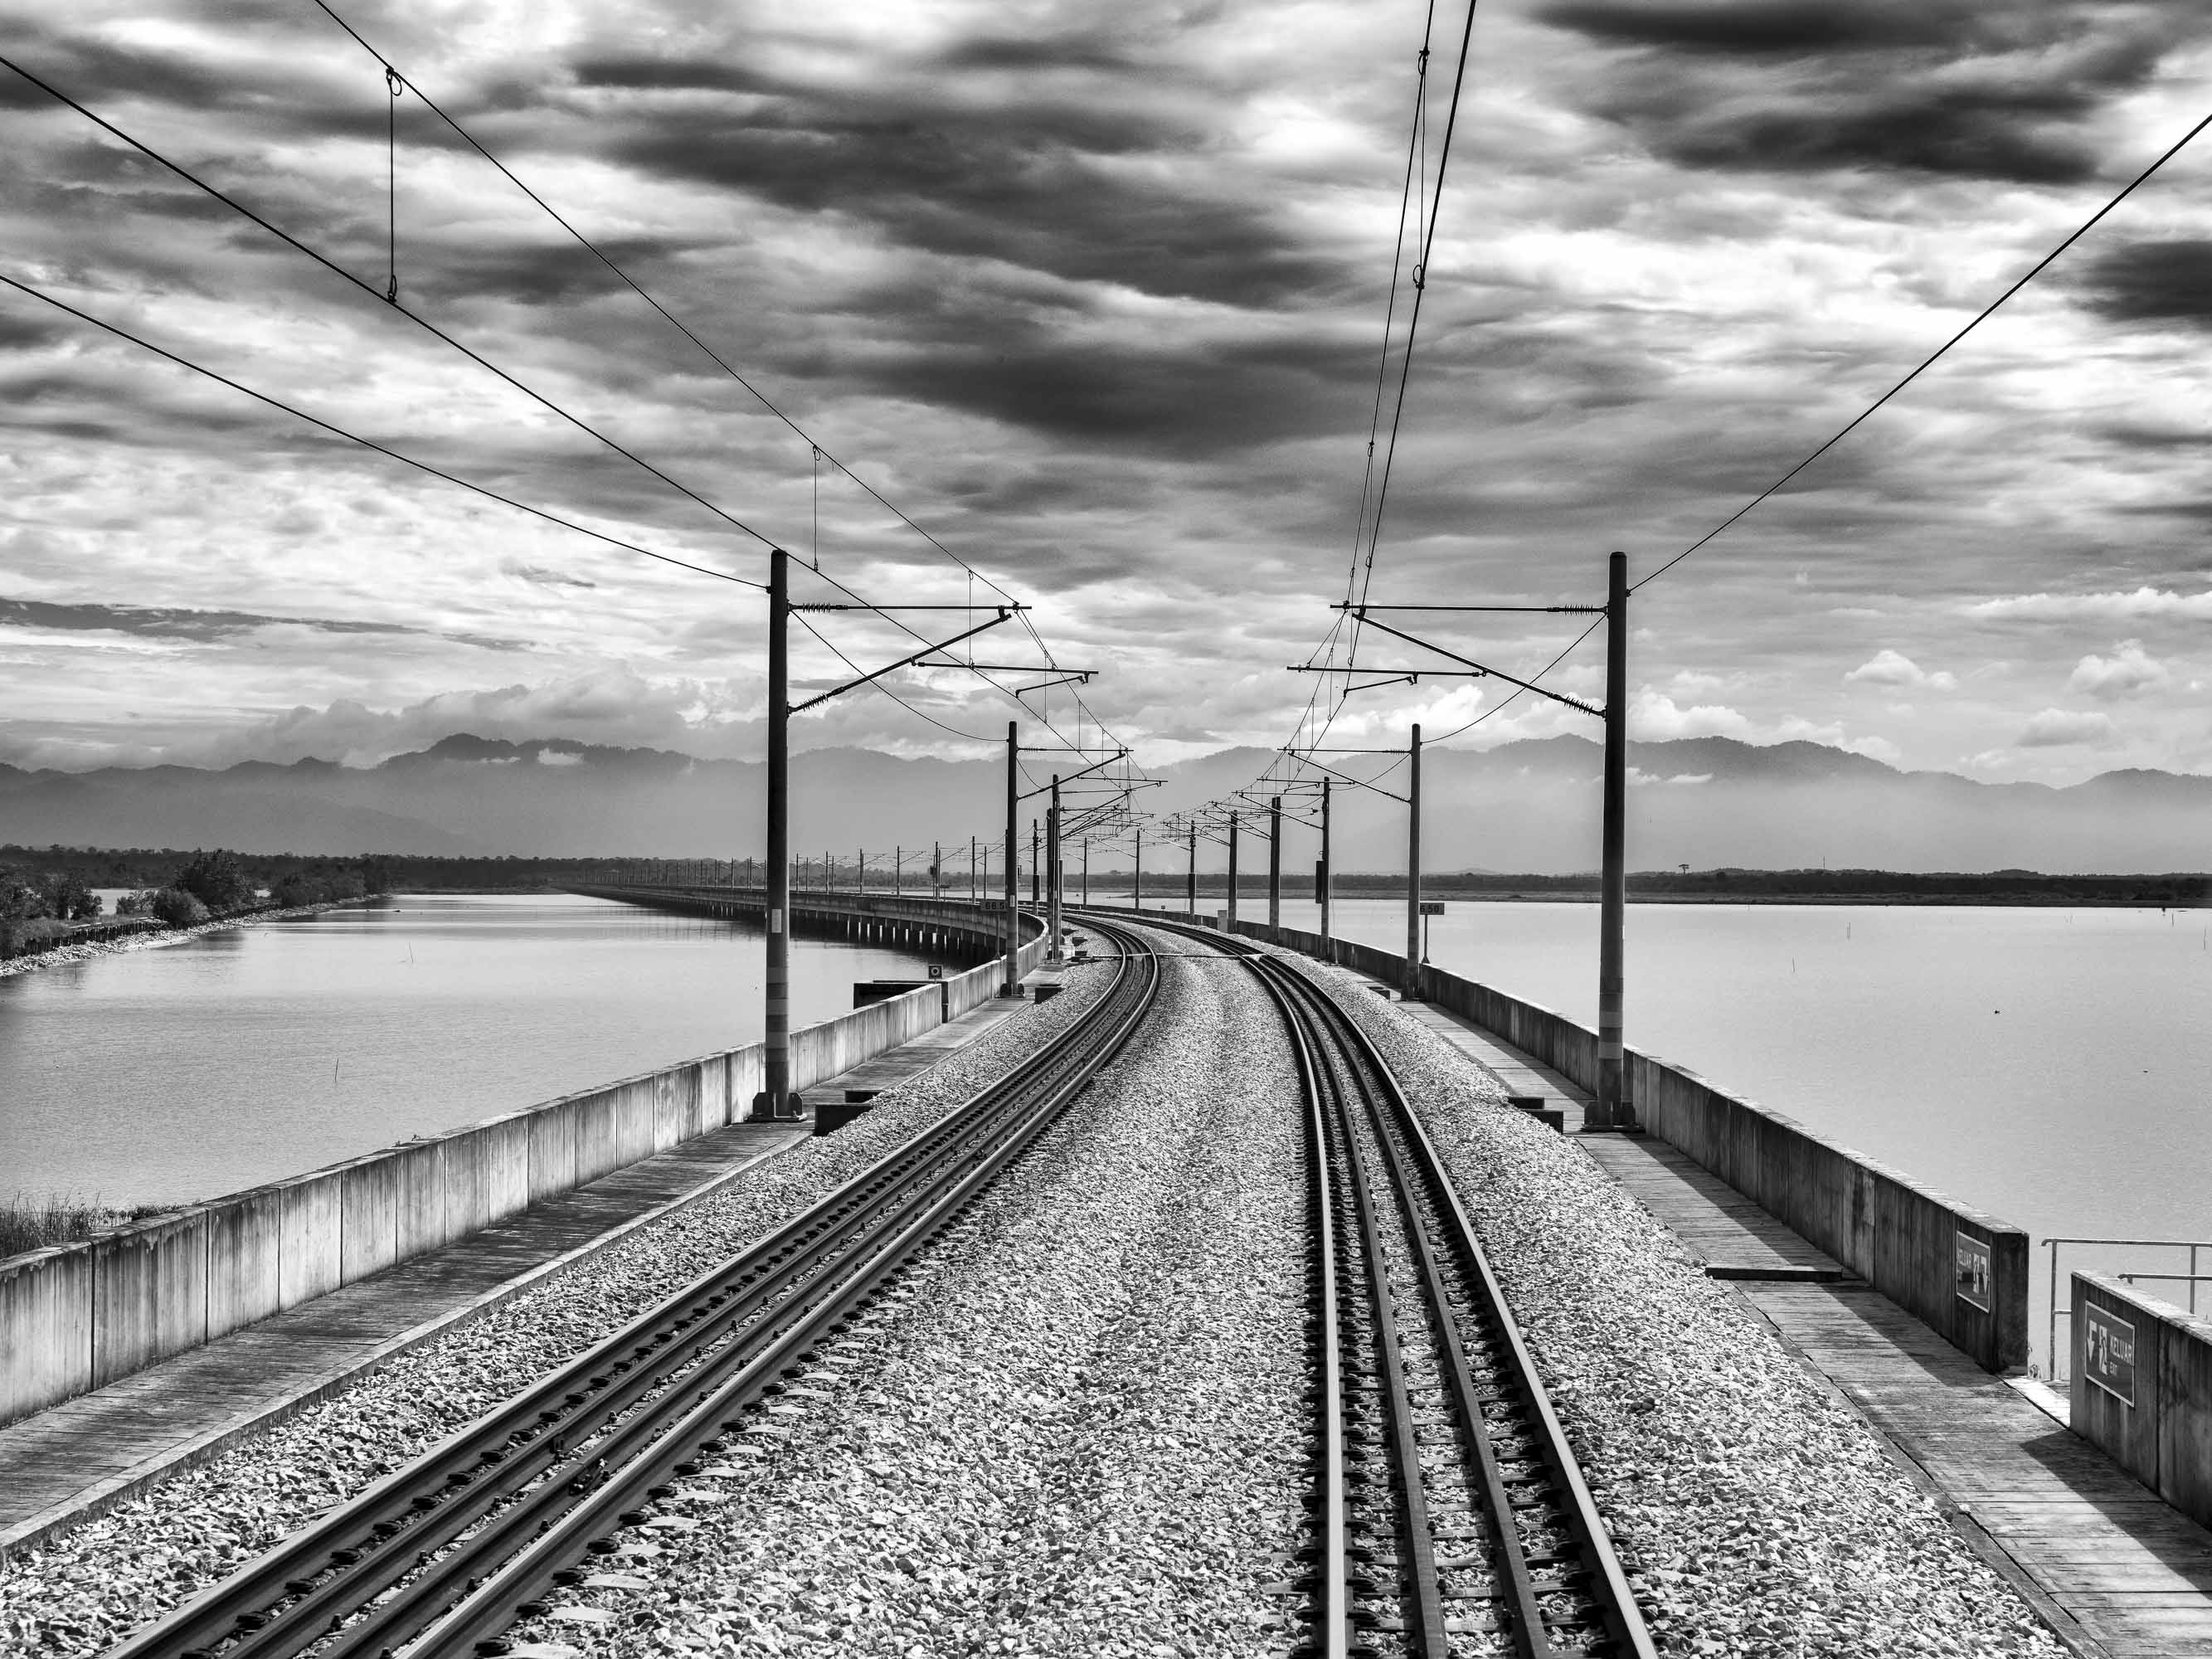 Eastern & Oriental Express belmond journey train travel southeast asia luxury e&o fujifilm GFX